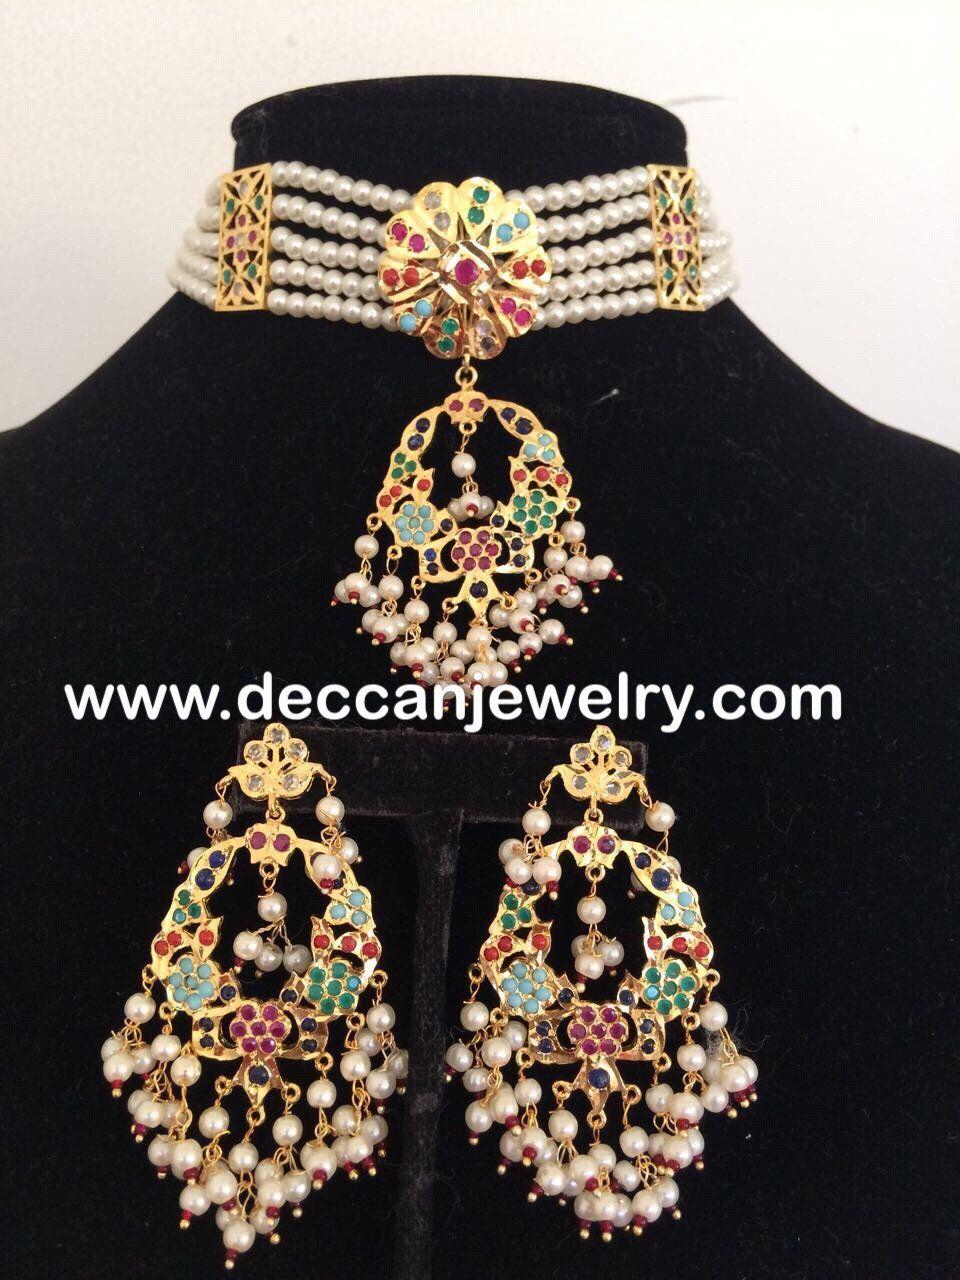 Madhuri navratan jadau choker earrings set in hyderabadi style